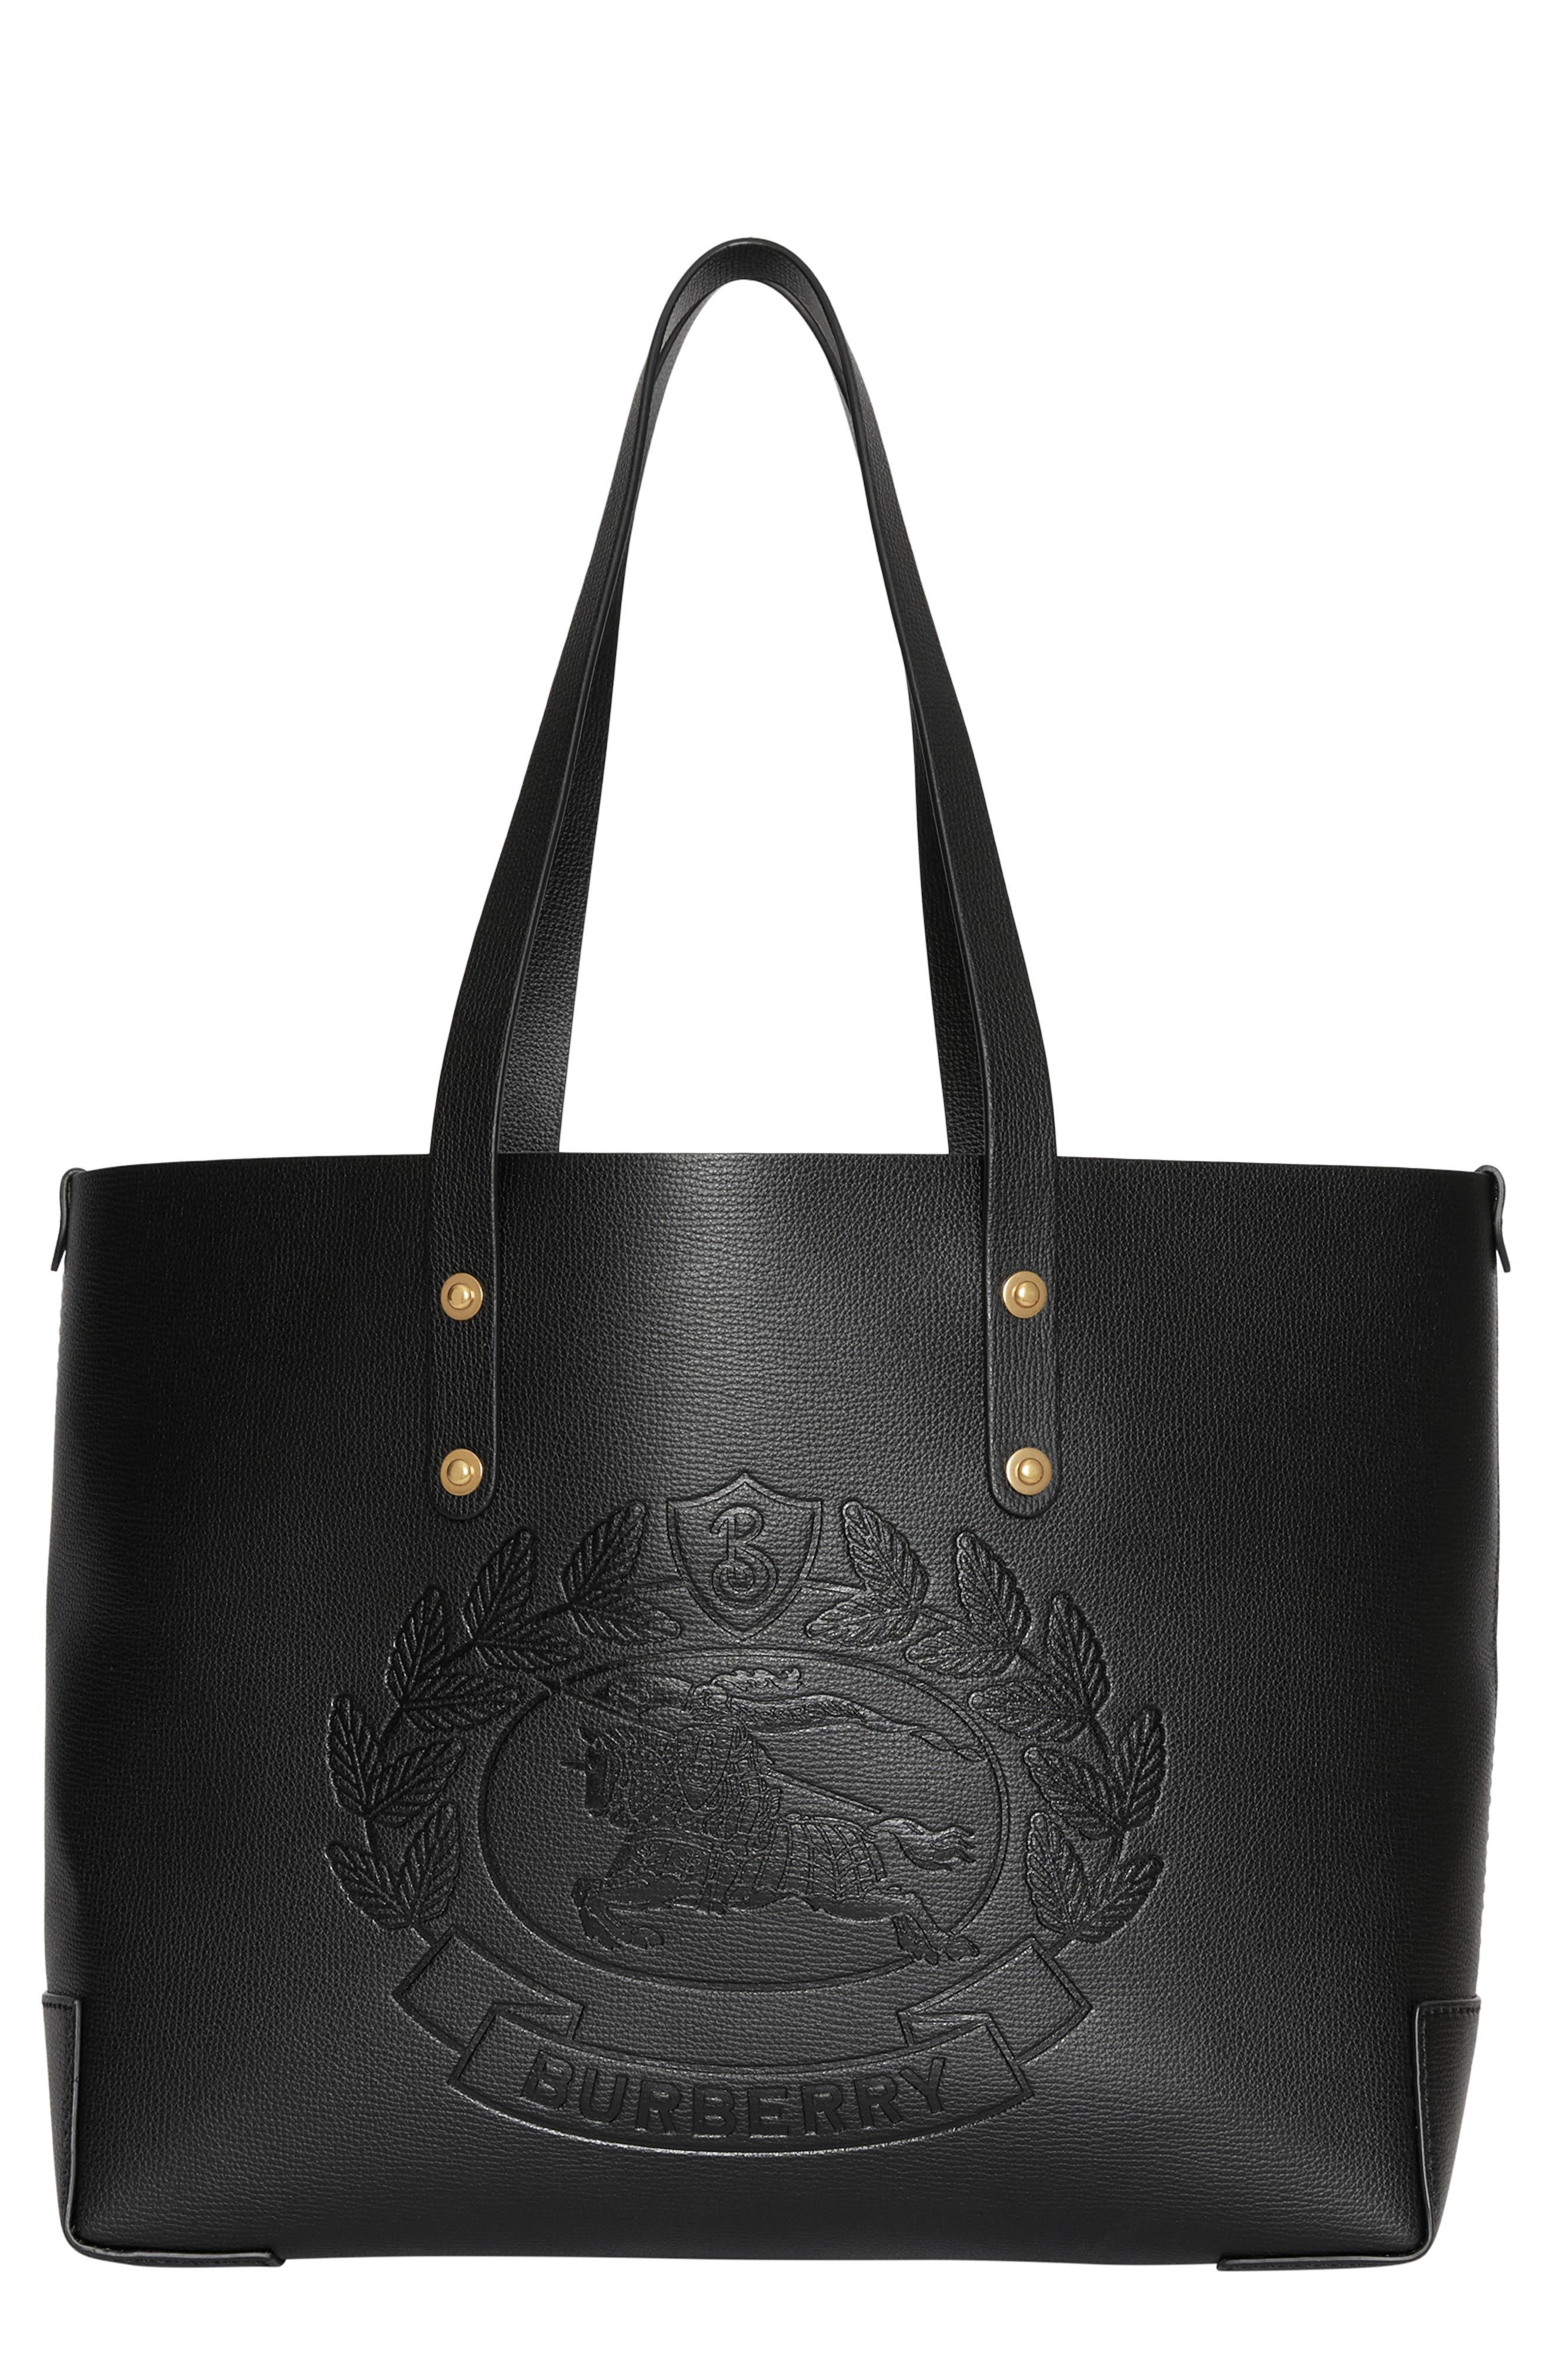 Wallets amp; Handbags Nordstrom Women's Burberry Purses 1IgxqA7